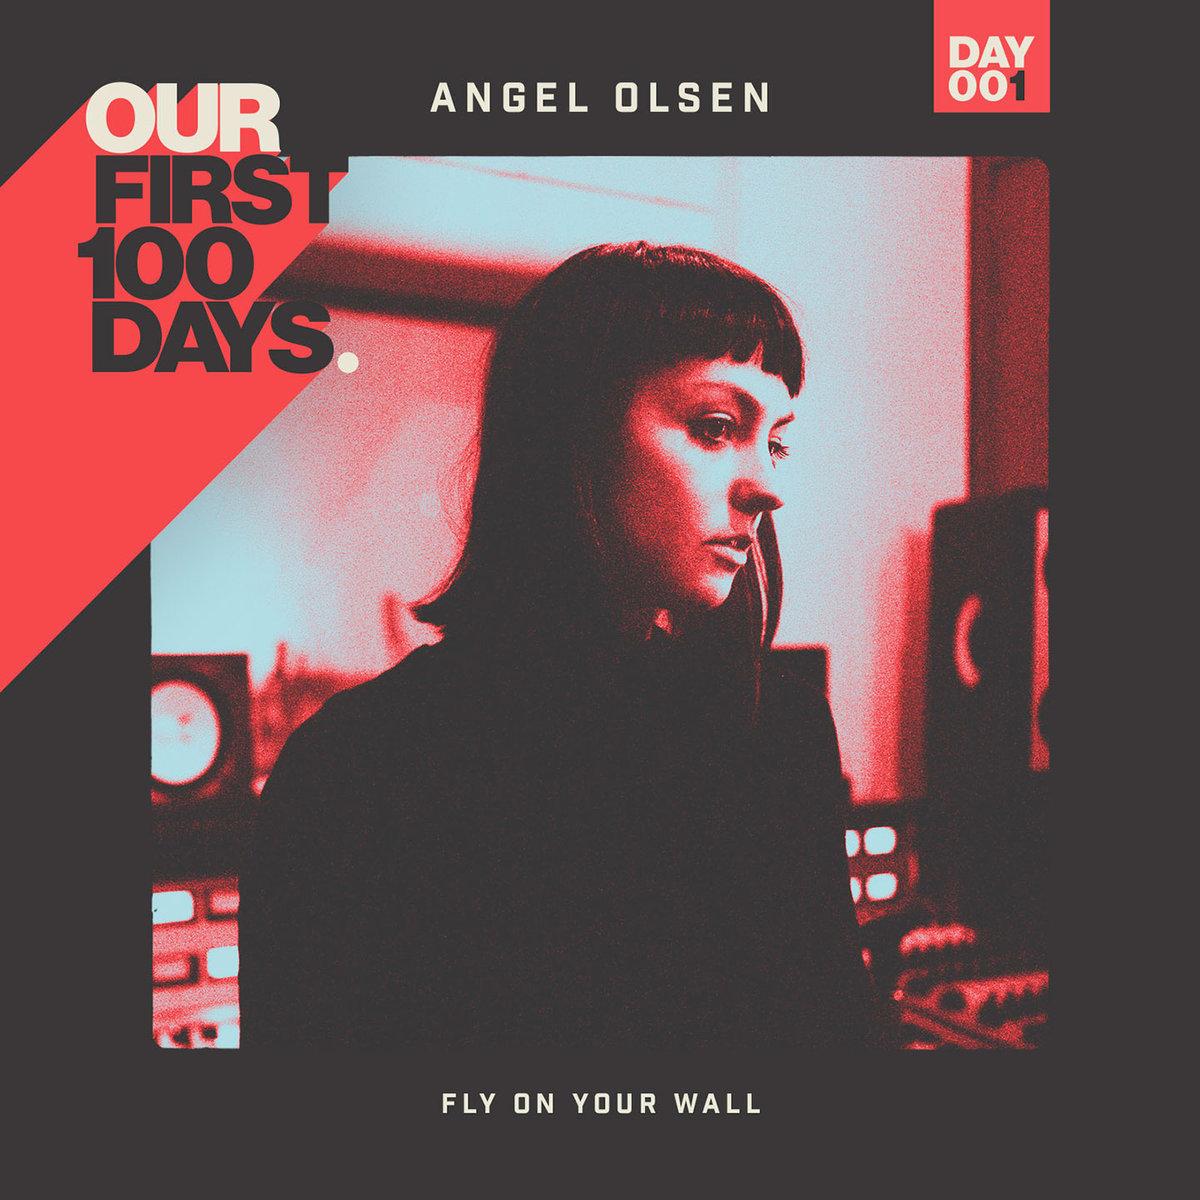 Angel Olsen выпустила новый трек «Fly On Your Wall» в рамках анти-трамповского сборника «Our First 100 Days»